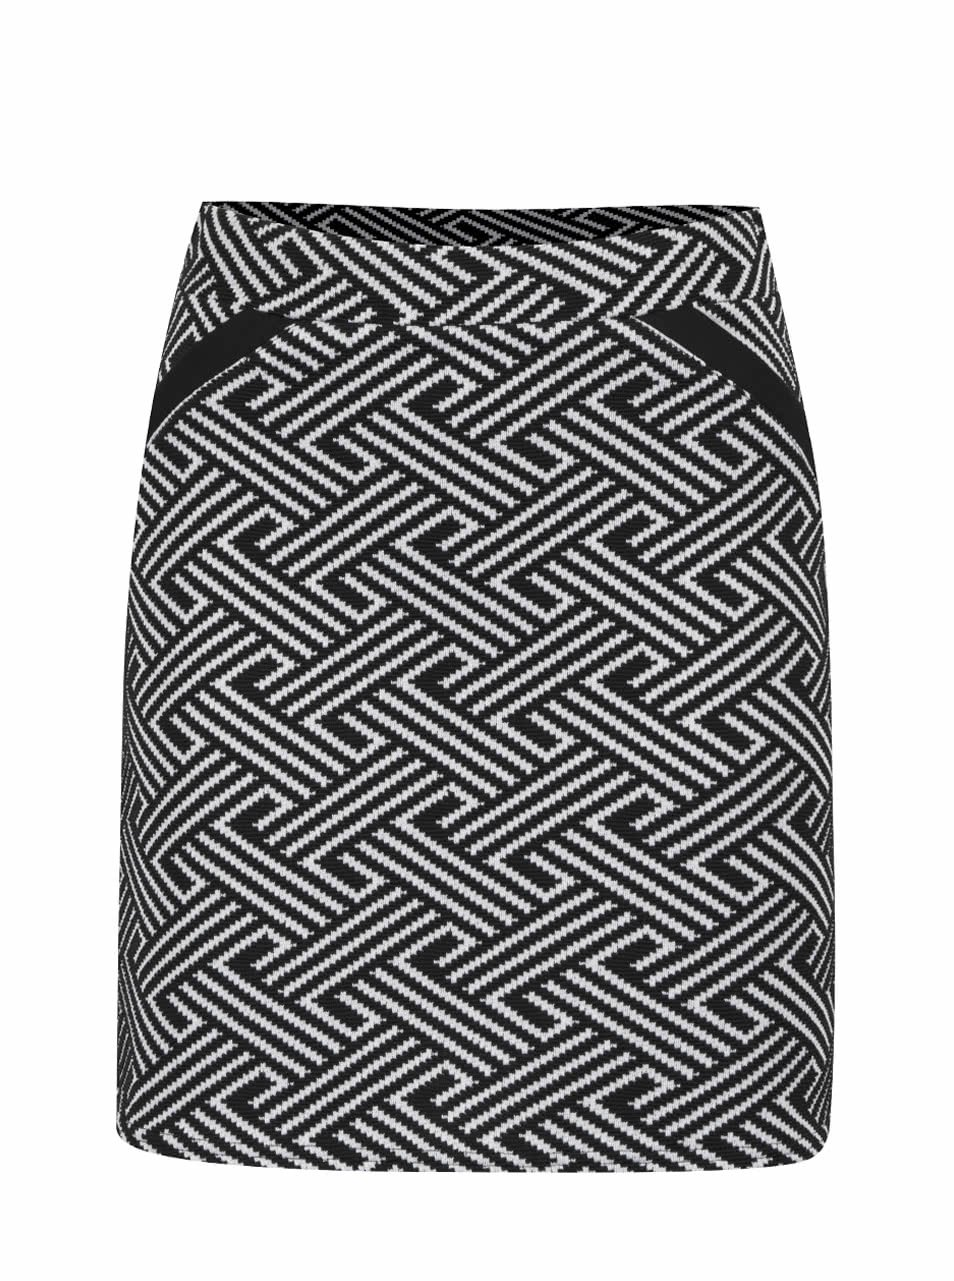 Krémovo-černá vzorovaná áčková sukně Miss Selfridge